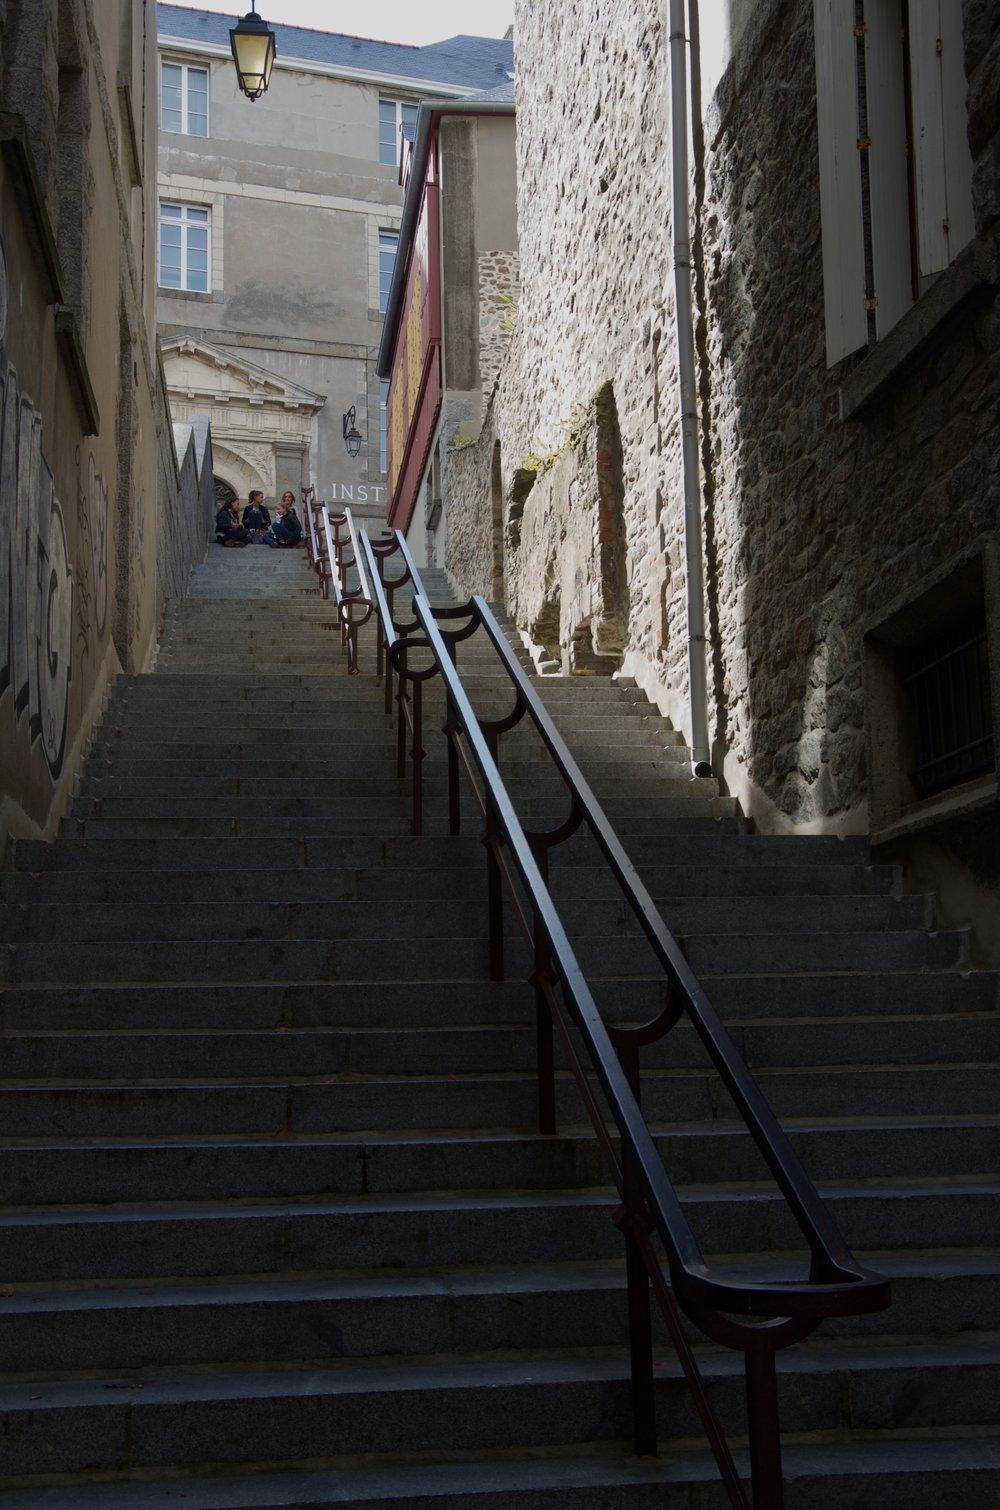 Escalier vers la rue du Collège, St-Malo